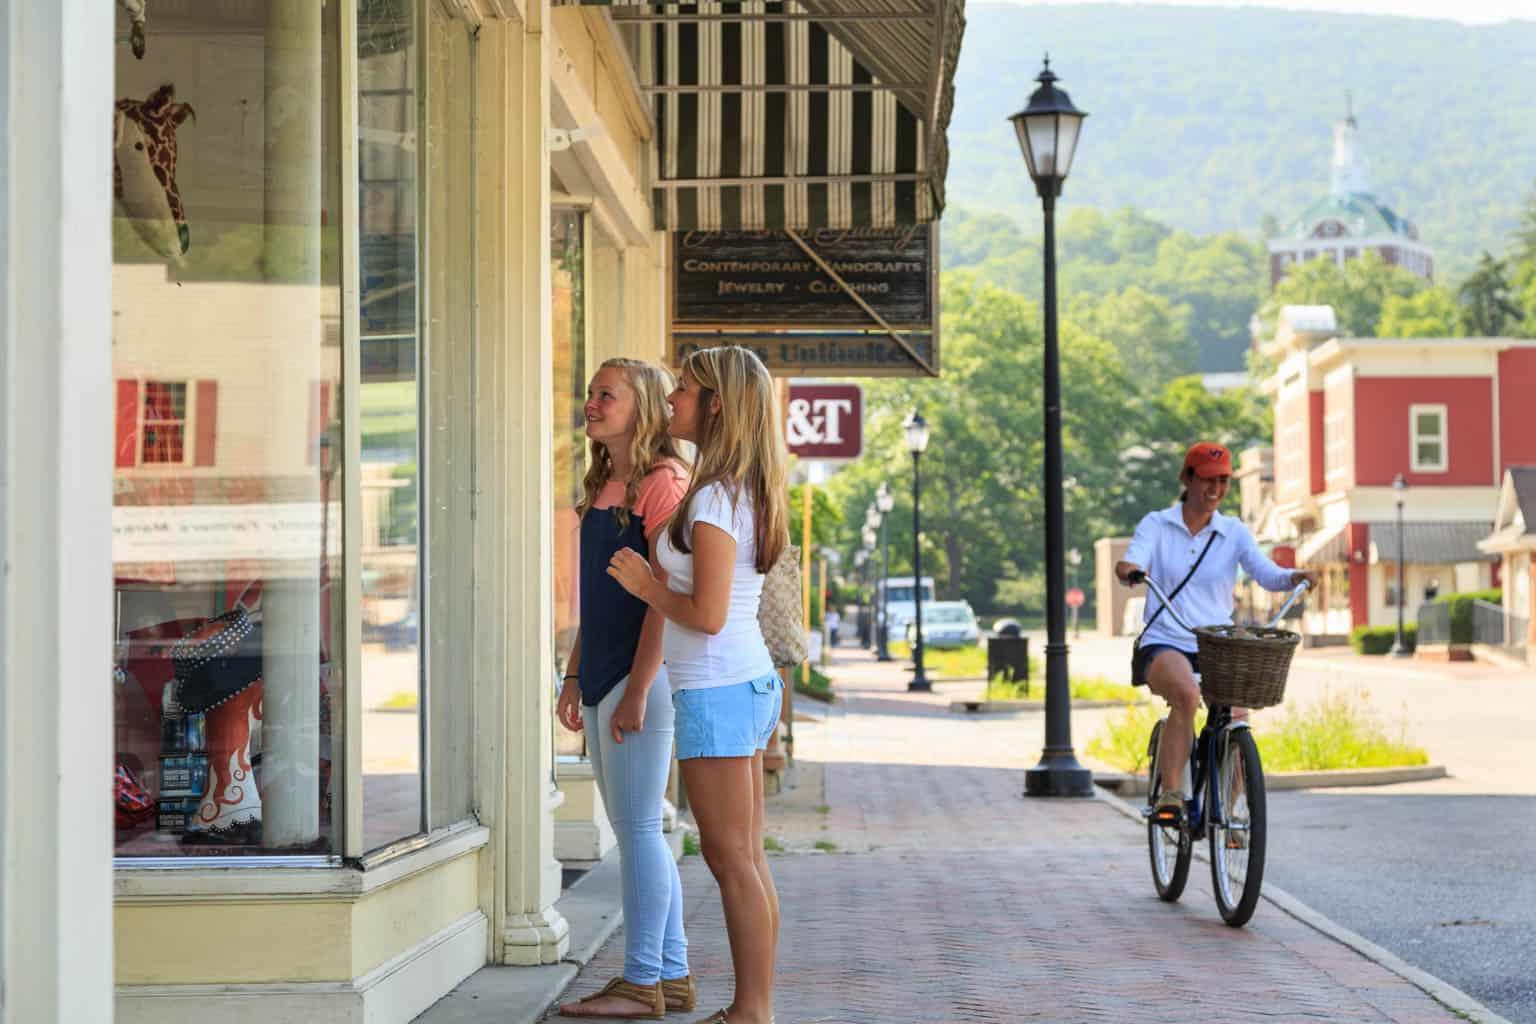 Bath-County-Virginia-Activitie-3352486446-O